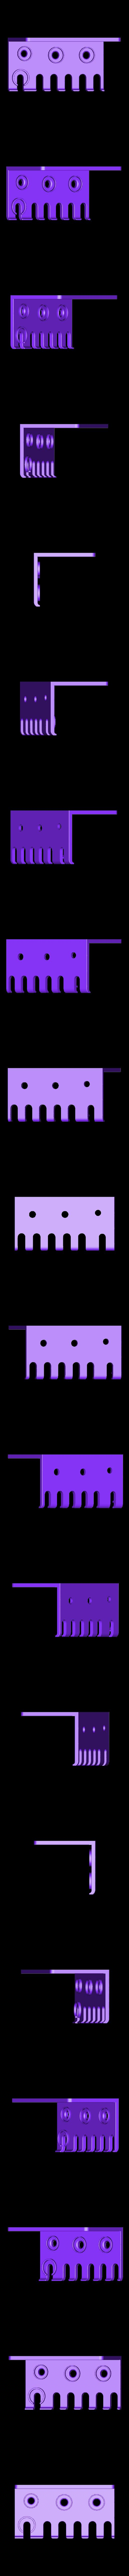 Left_Screws.stl Download free STL file Tool Holder for 18pcs Screwdriver Set 059 I for screws or peg board • 3D printing template, Wiesemann1893